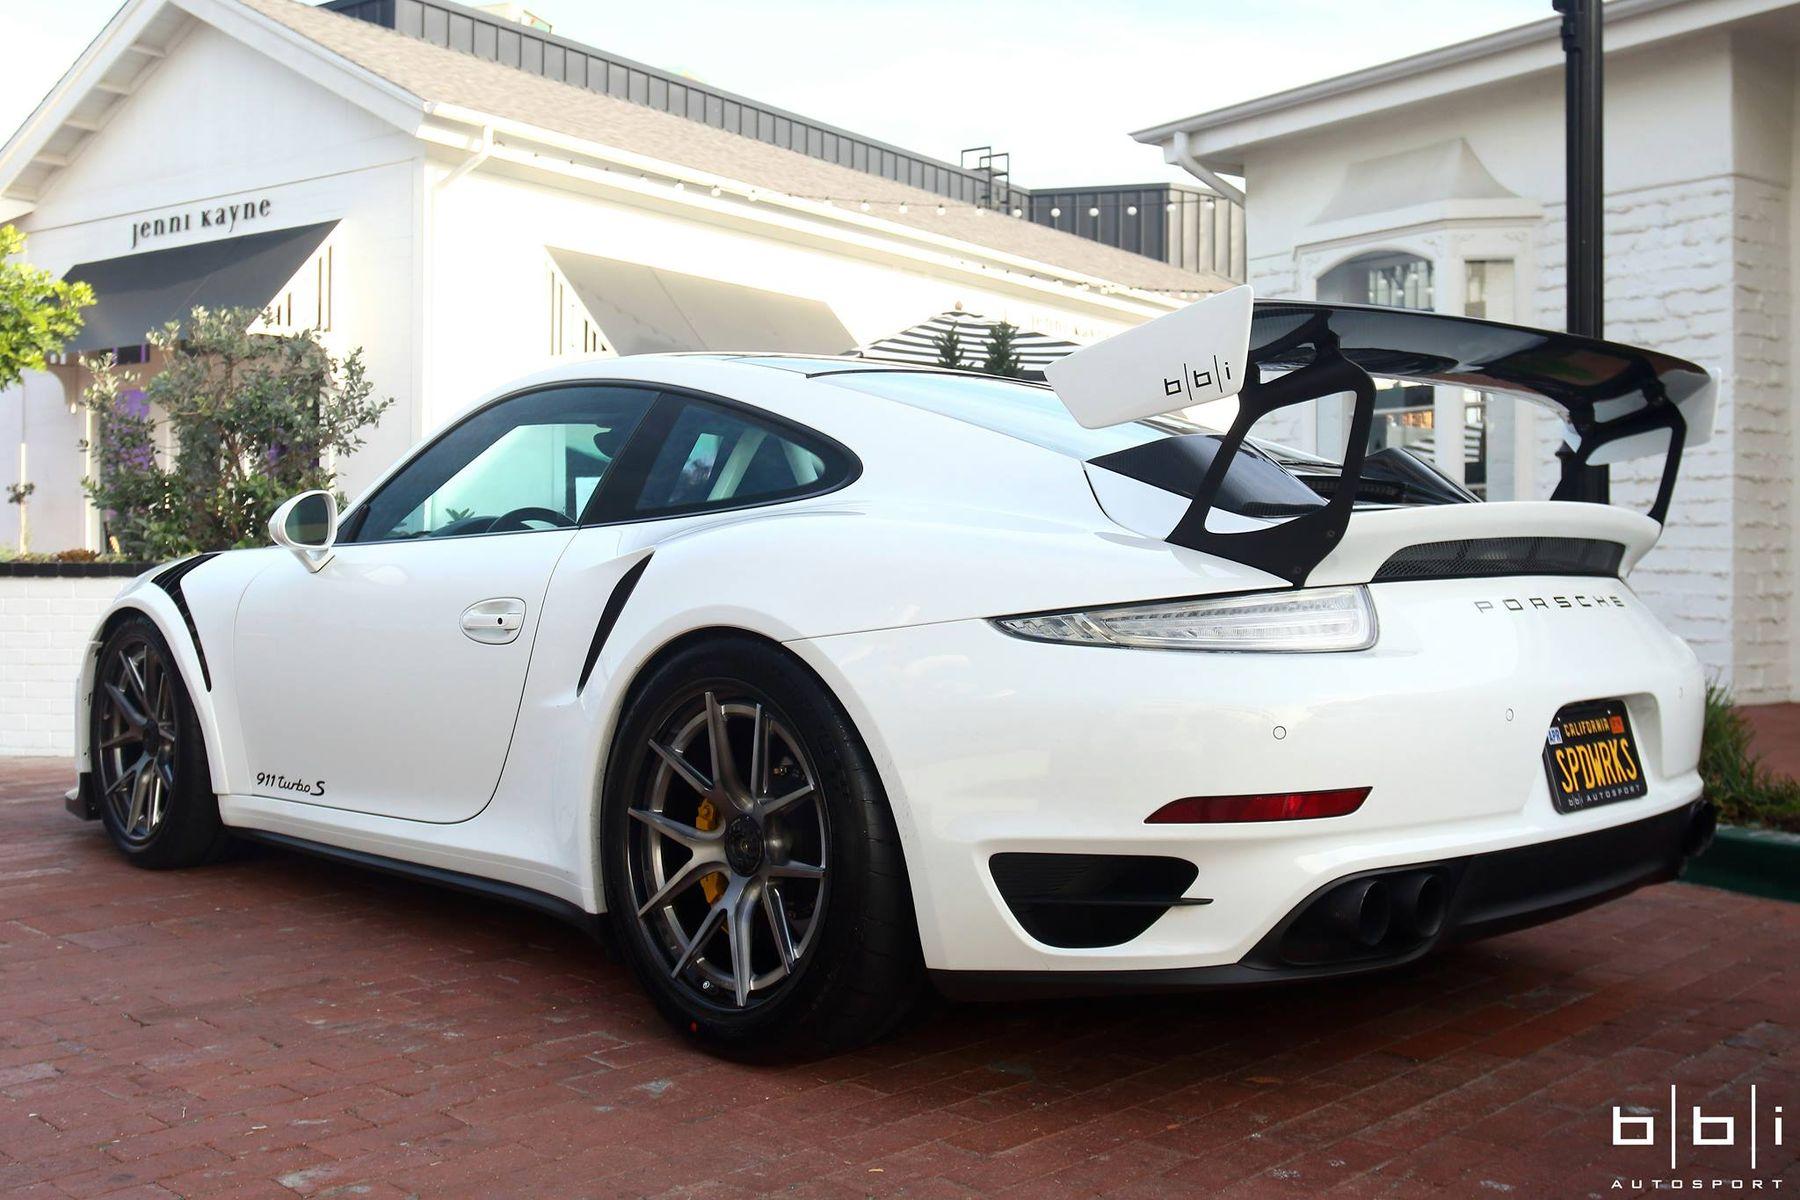 2014 Porsche 911 | Wes' BBi Autosport Porsche 991 Turbo with 991.2 GT3 Conversion on Forgeline Carbon+Forged CF201 Wheels